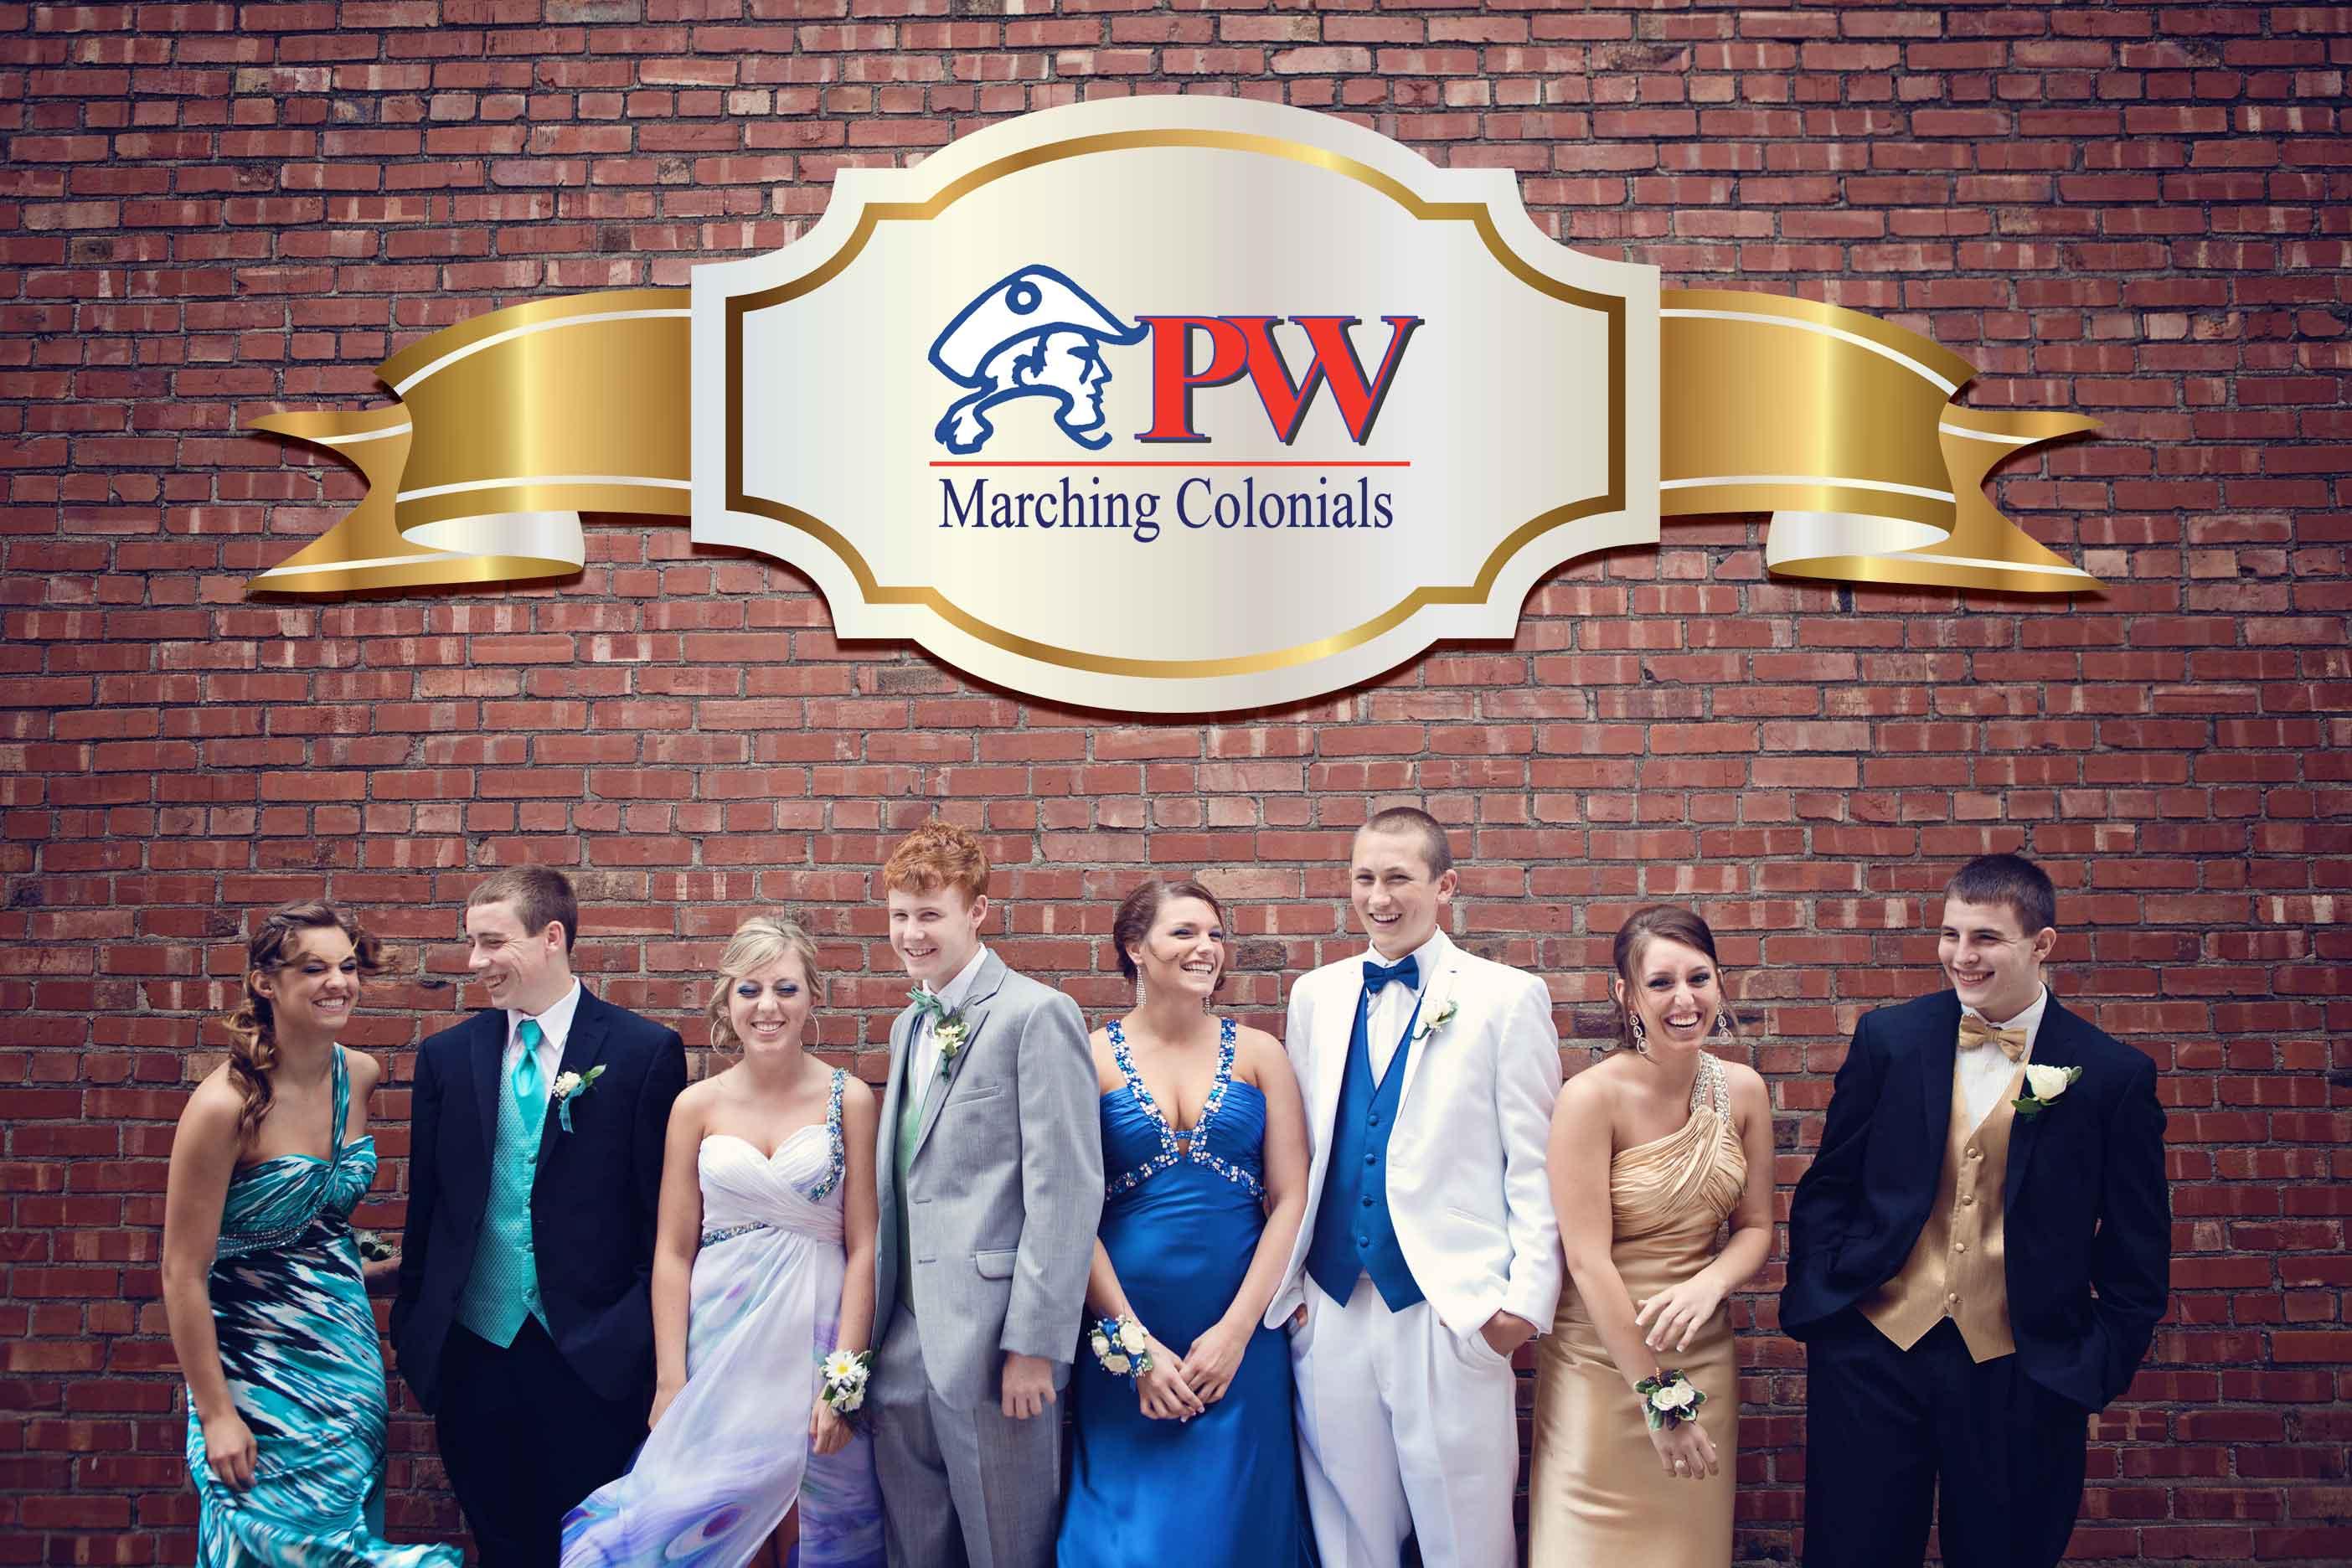 plymouth whitemarsh high school prom